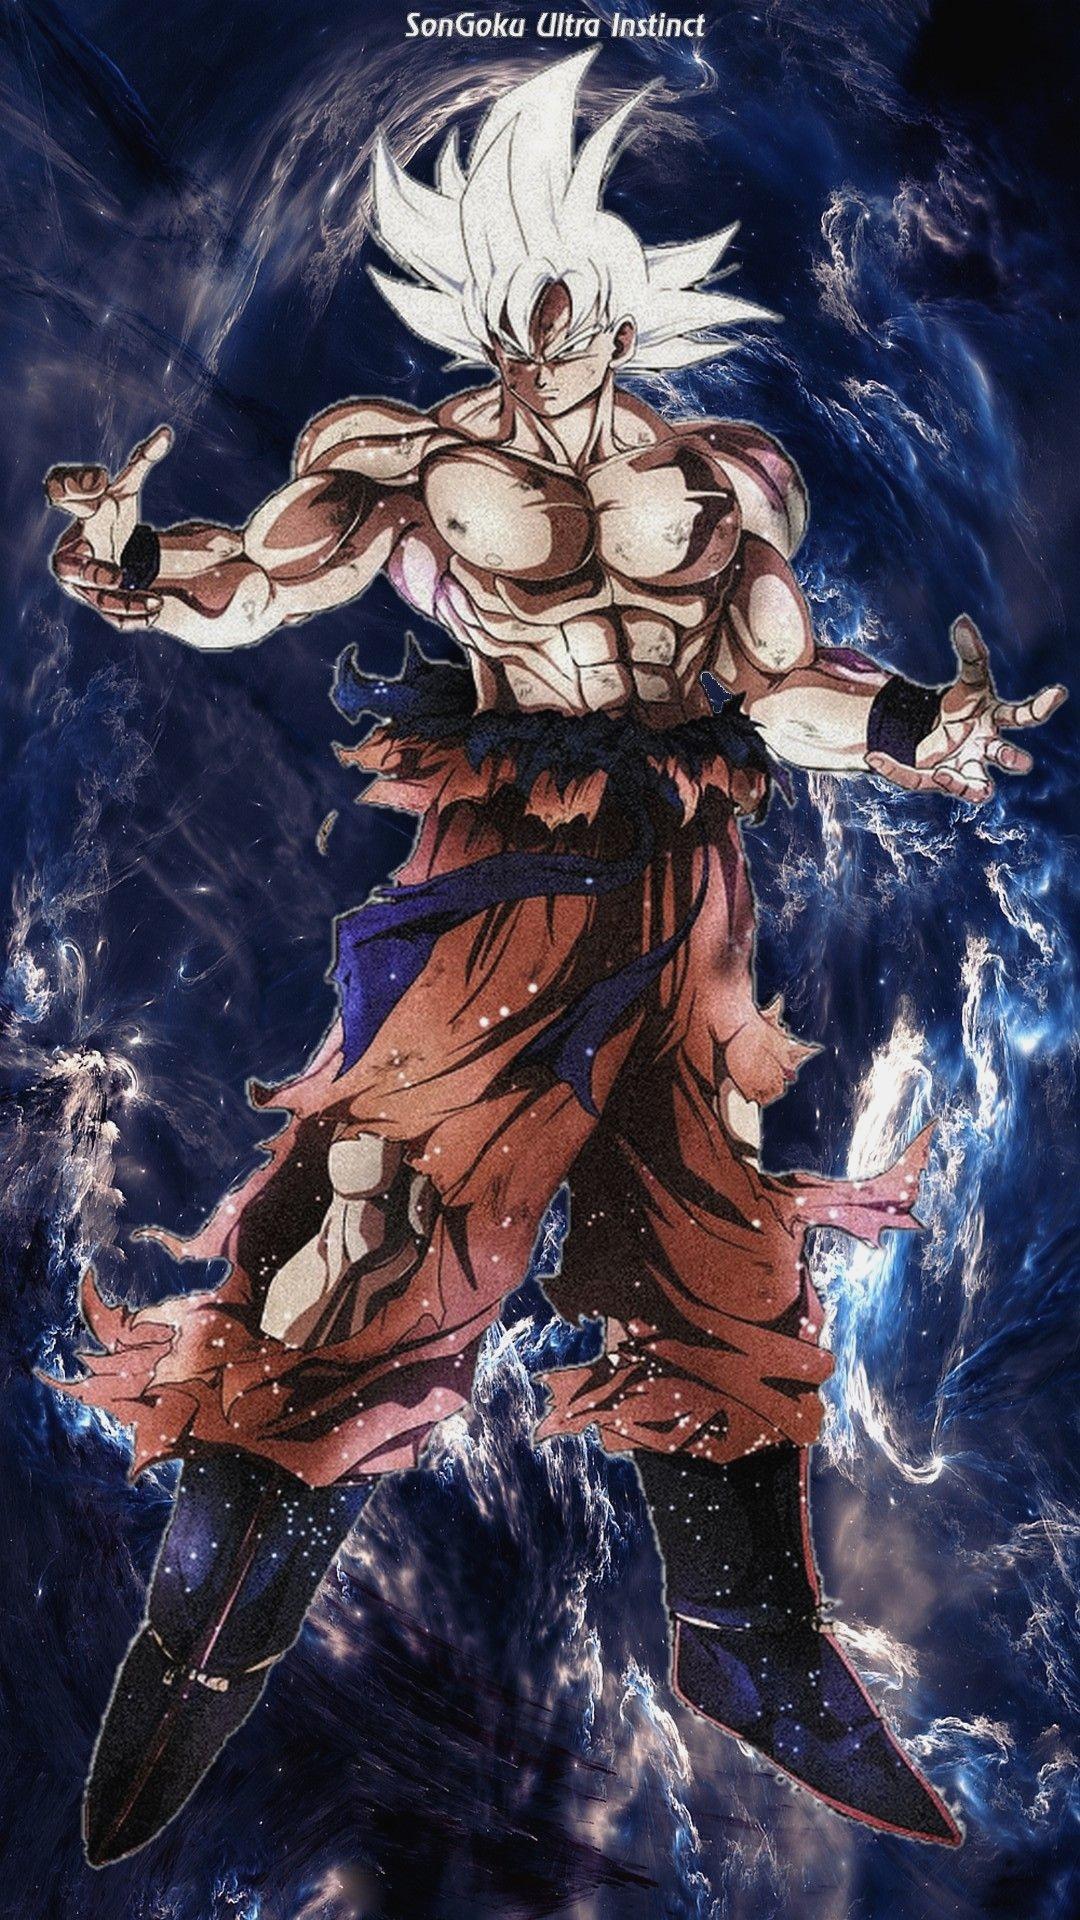 Son Goku Ultra Instinct 2247704 Hd Wallpaper Backgrounds Download